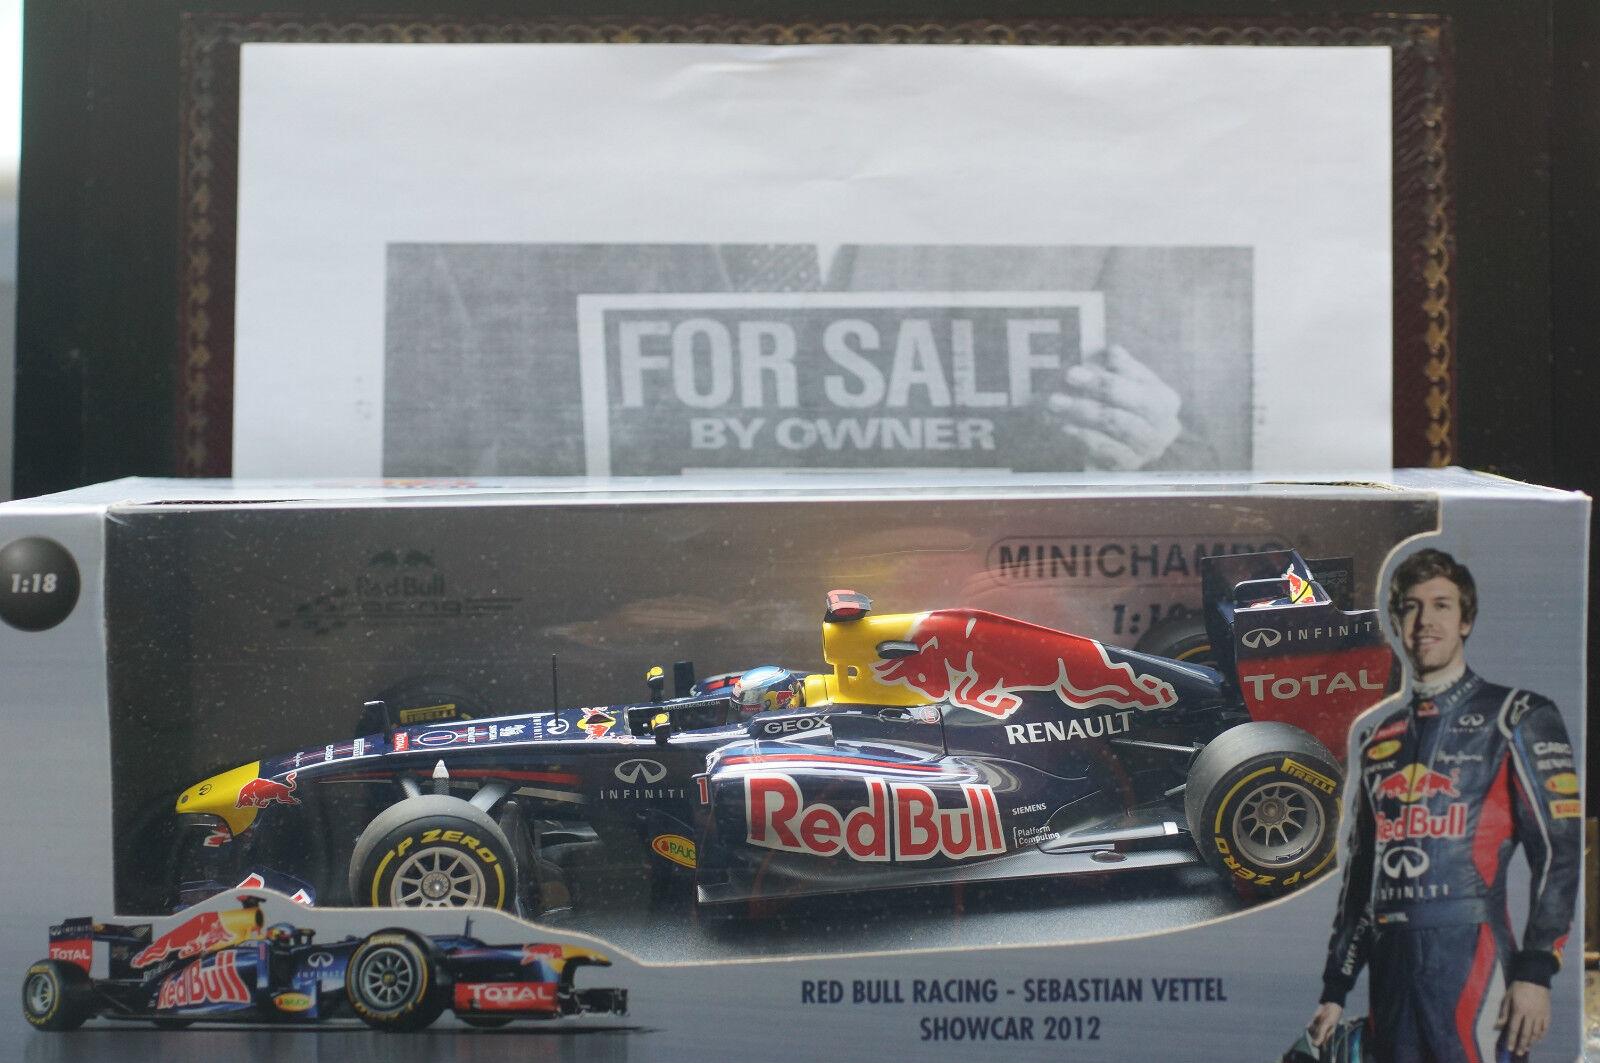 Minichamps rouge Bull S Vettel 2012 1 18 scale RENAULT-F1 Car Memorabilia